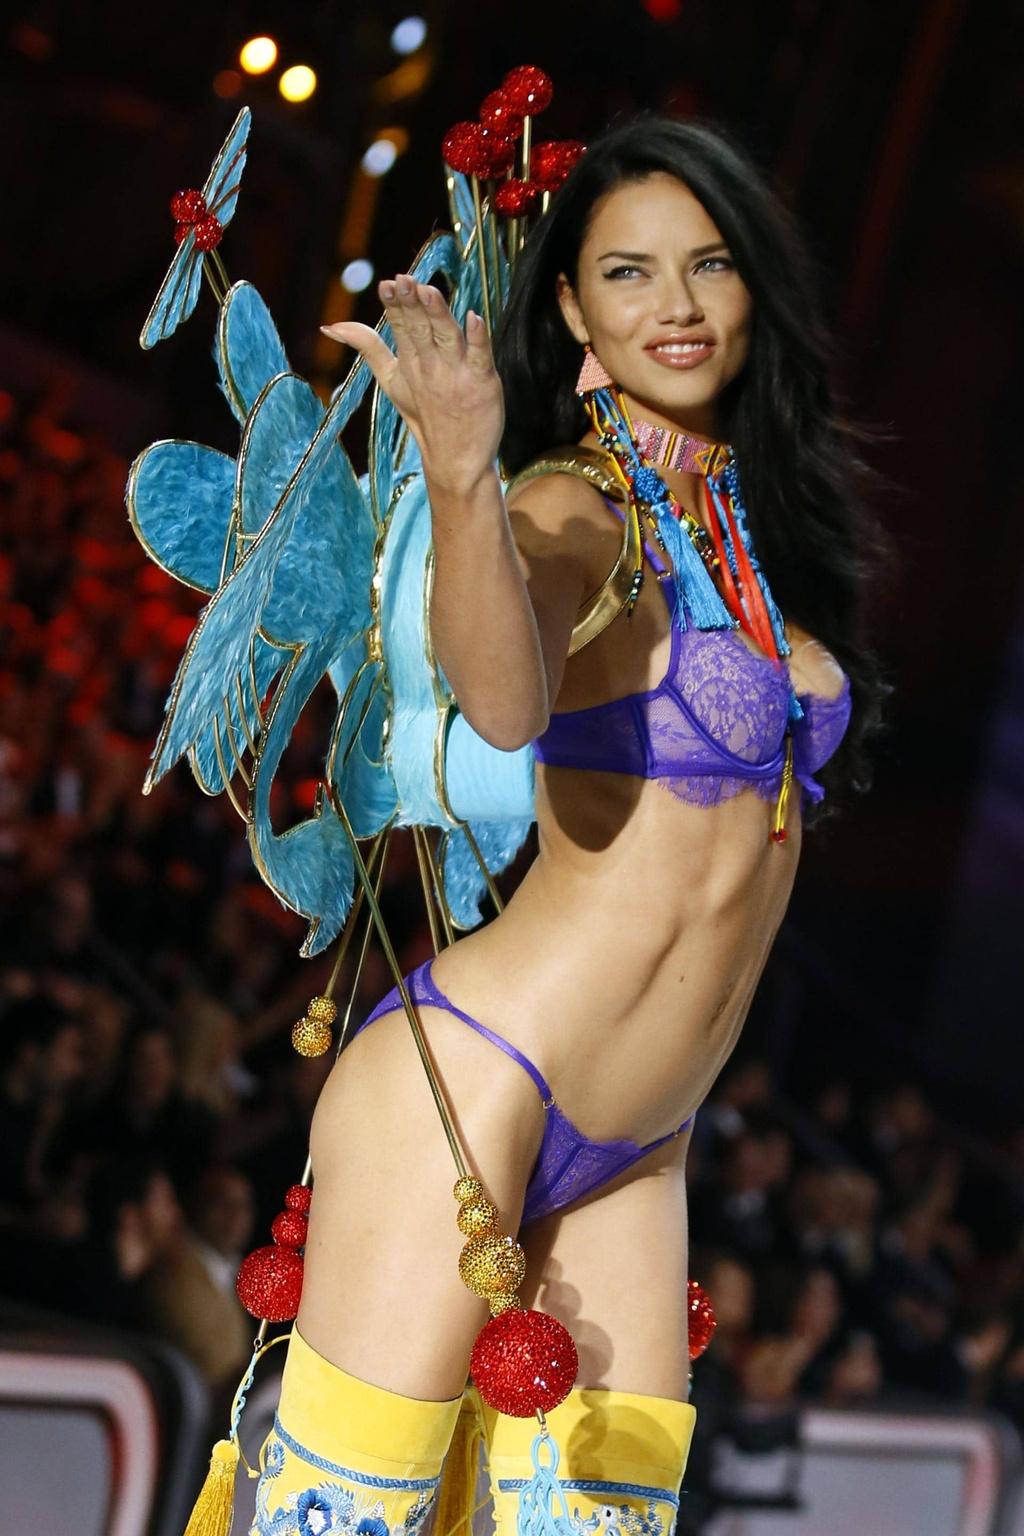 Adriana Lima - sieu mau xinh dep, khoac canh thien than 18 nam hinh anh 2